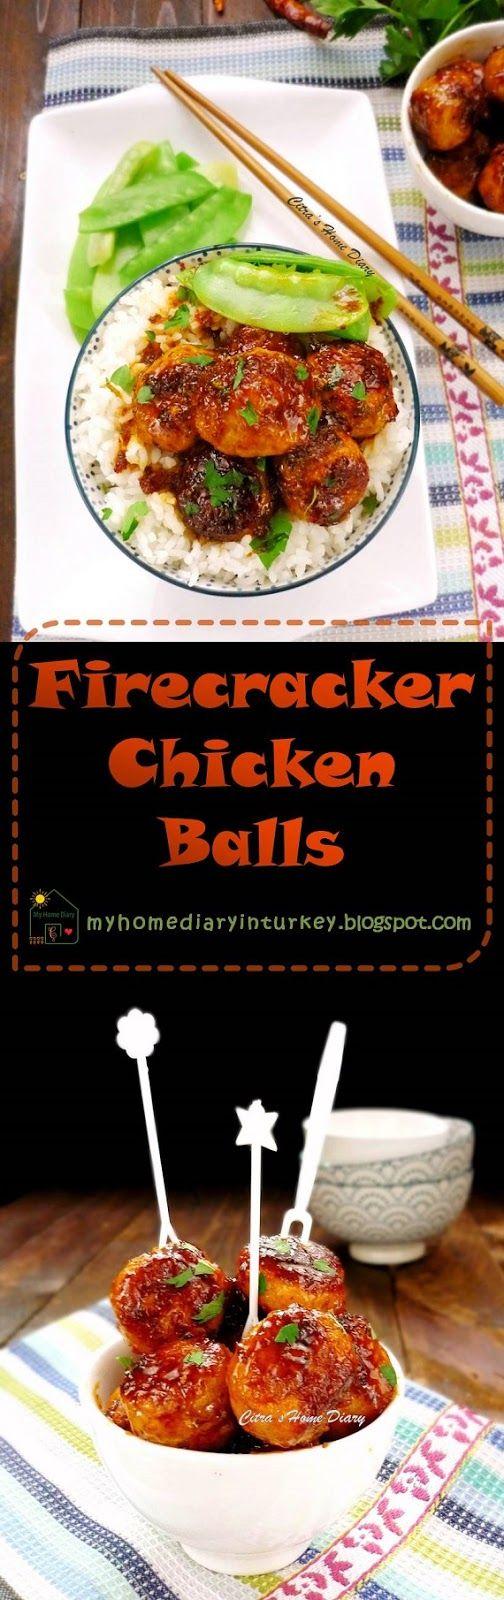 Firecracker chicken balls Recipe